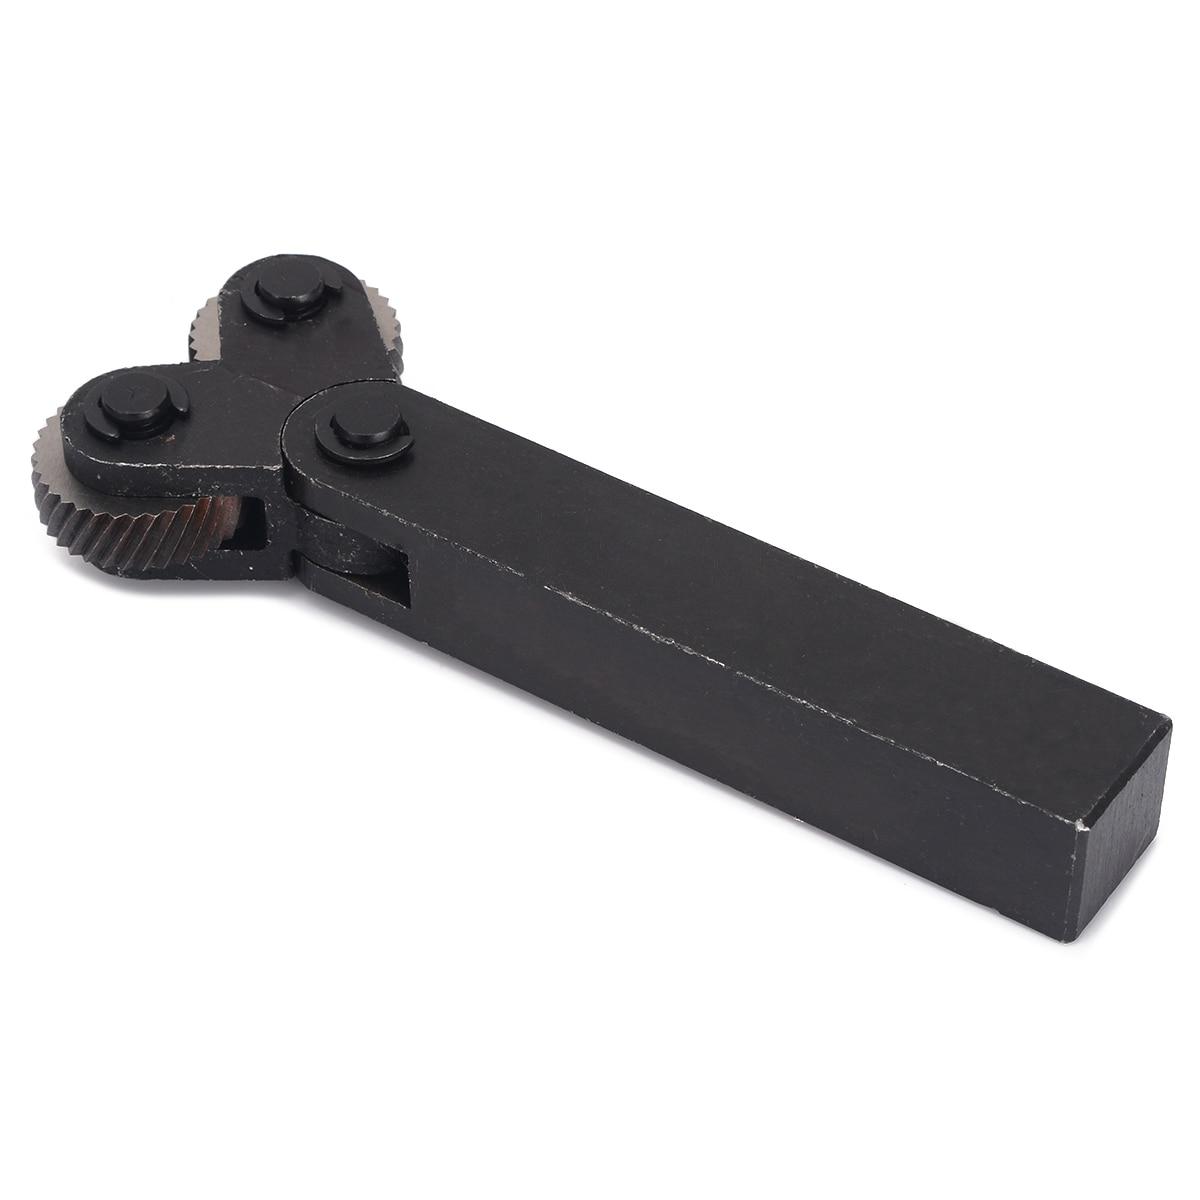 7Pcs Knurling Tool 0.5/1/2mm Diagonal Dual Wheel Linear Knurl Set Steel Lathe Cutter Wheel Knurling Tool Set